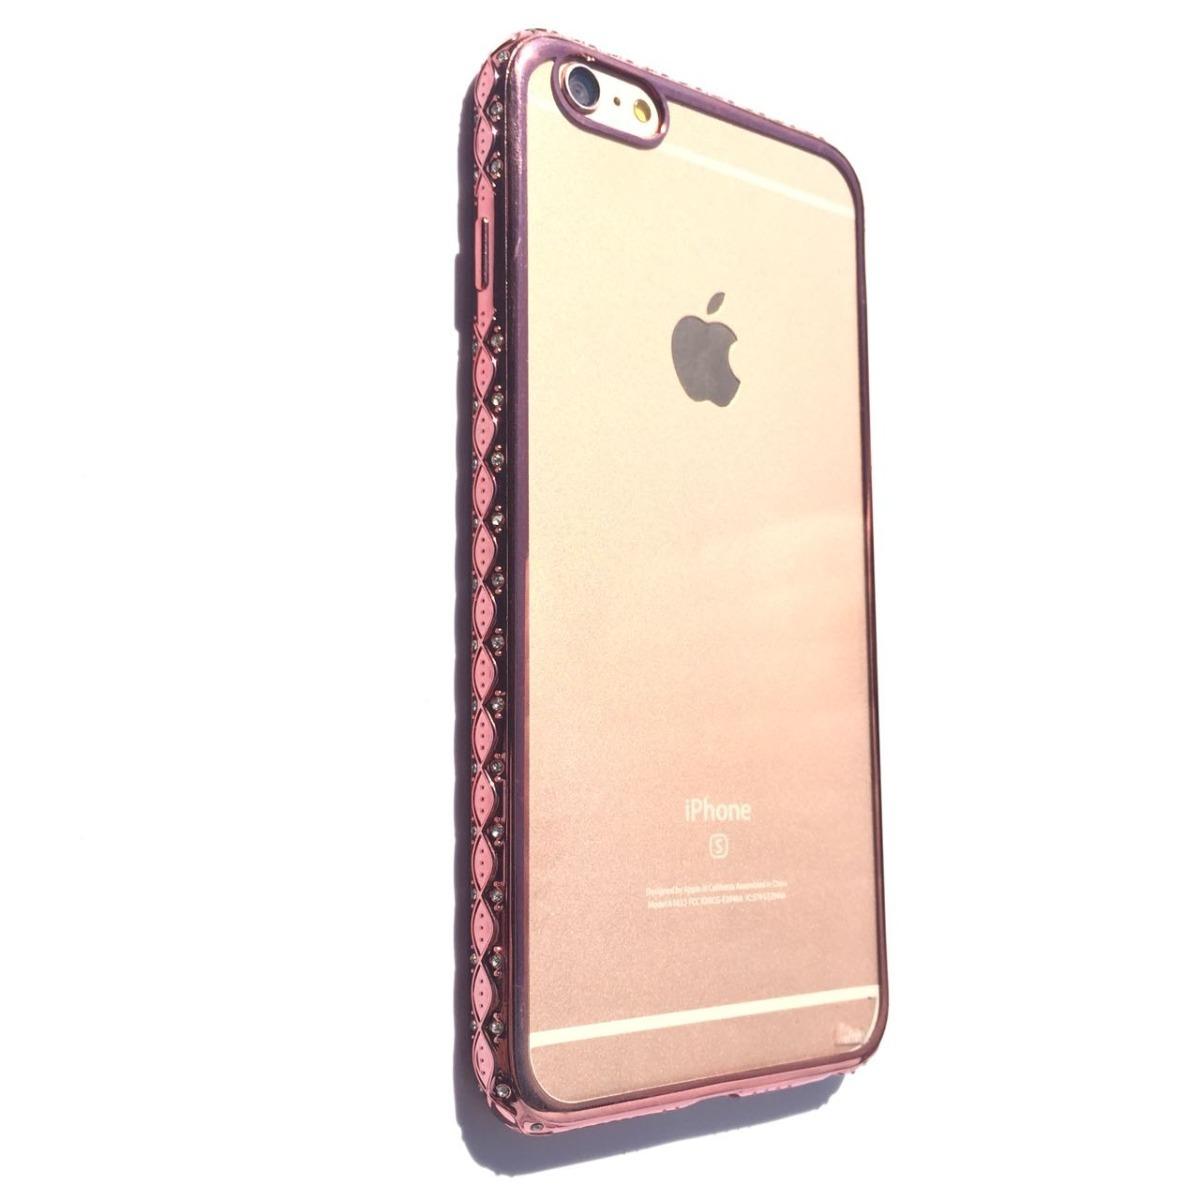 f104b5ec10a funda tpu hibrido con swarovski ros iphone 6 plus / 6s plus. Cargando zoom.